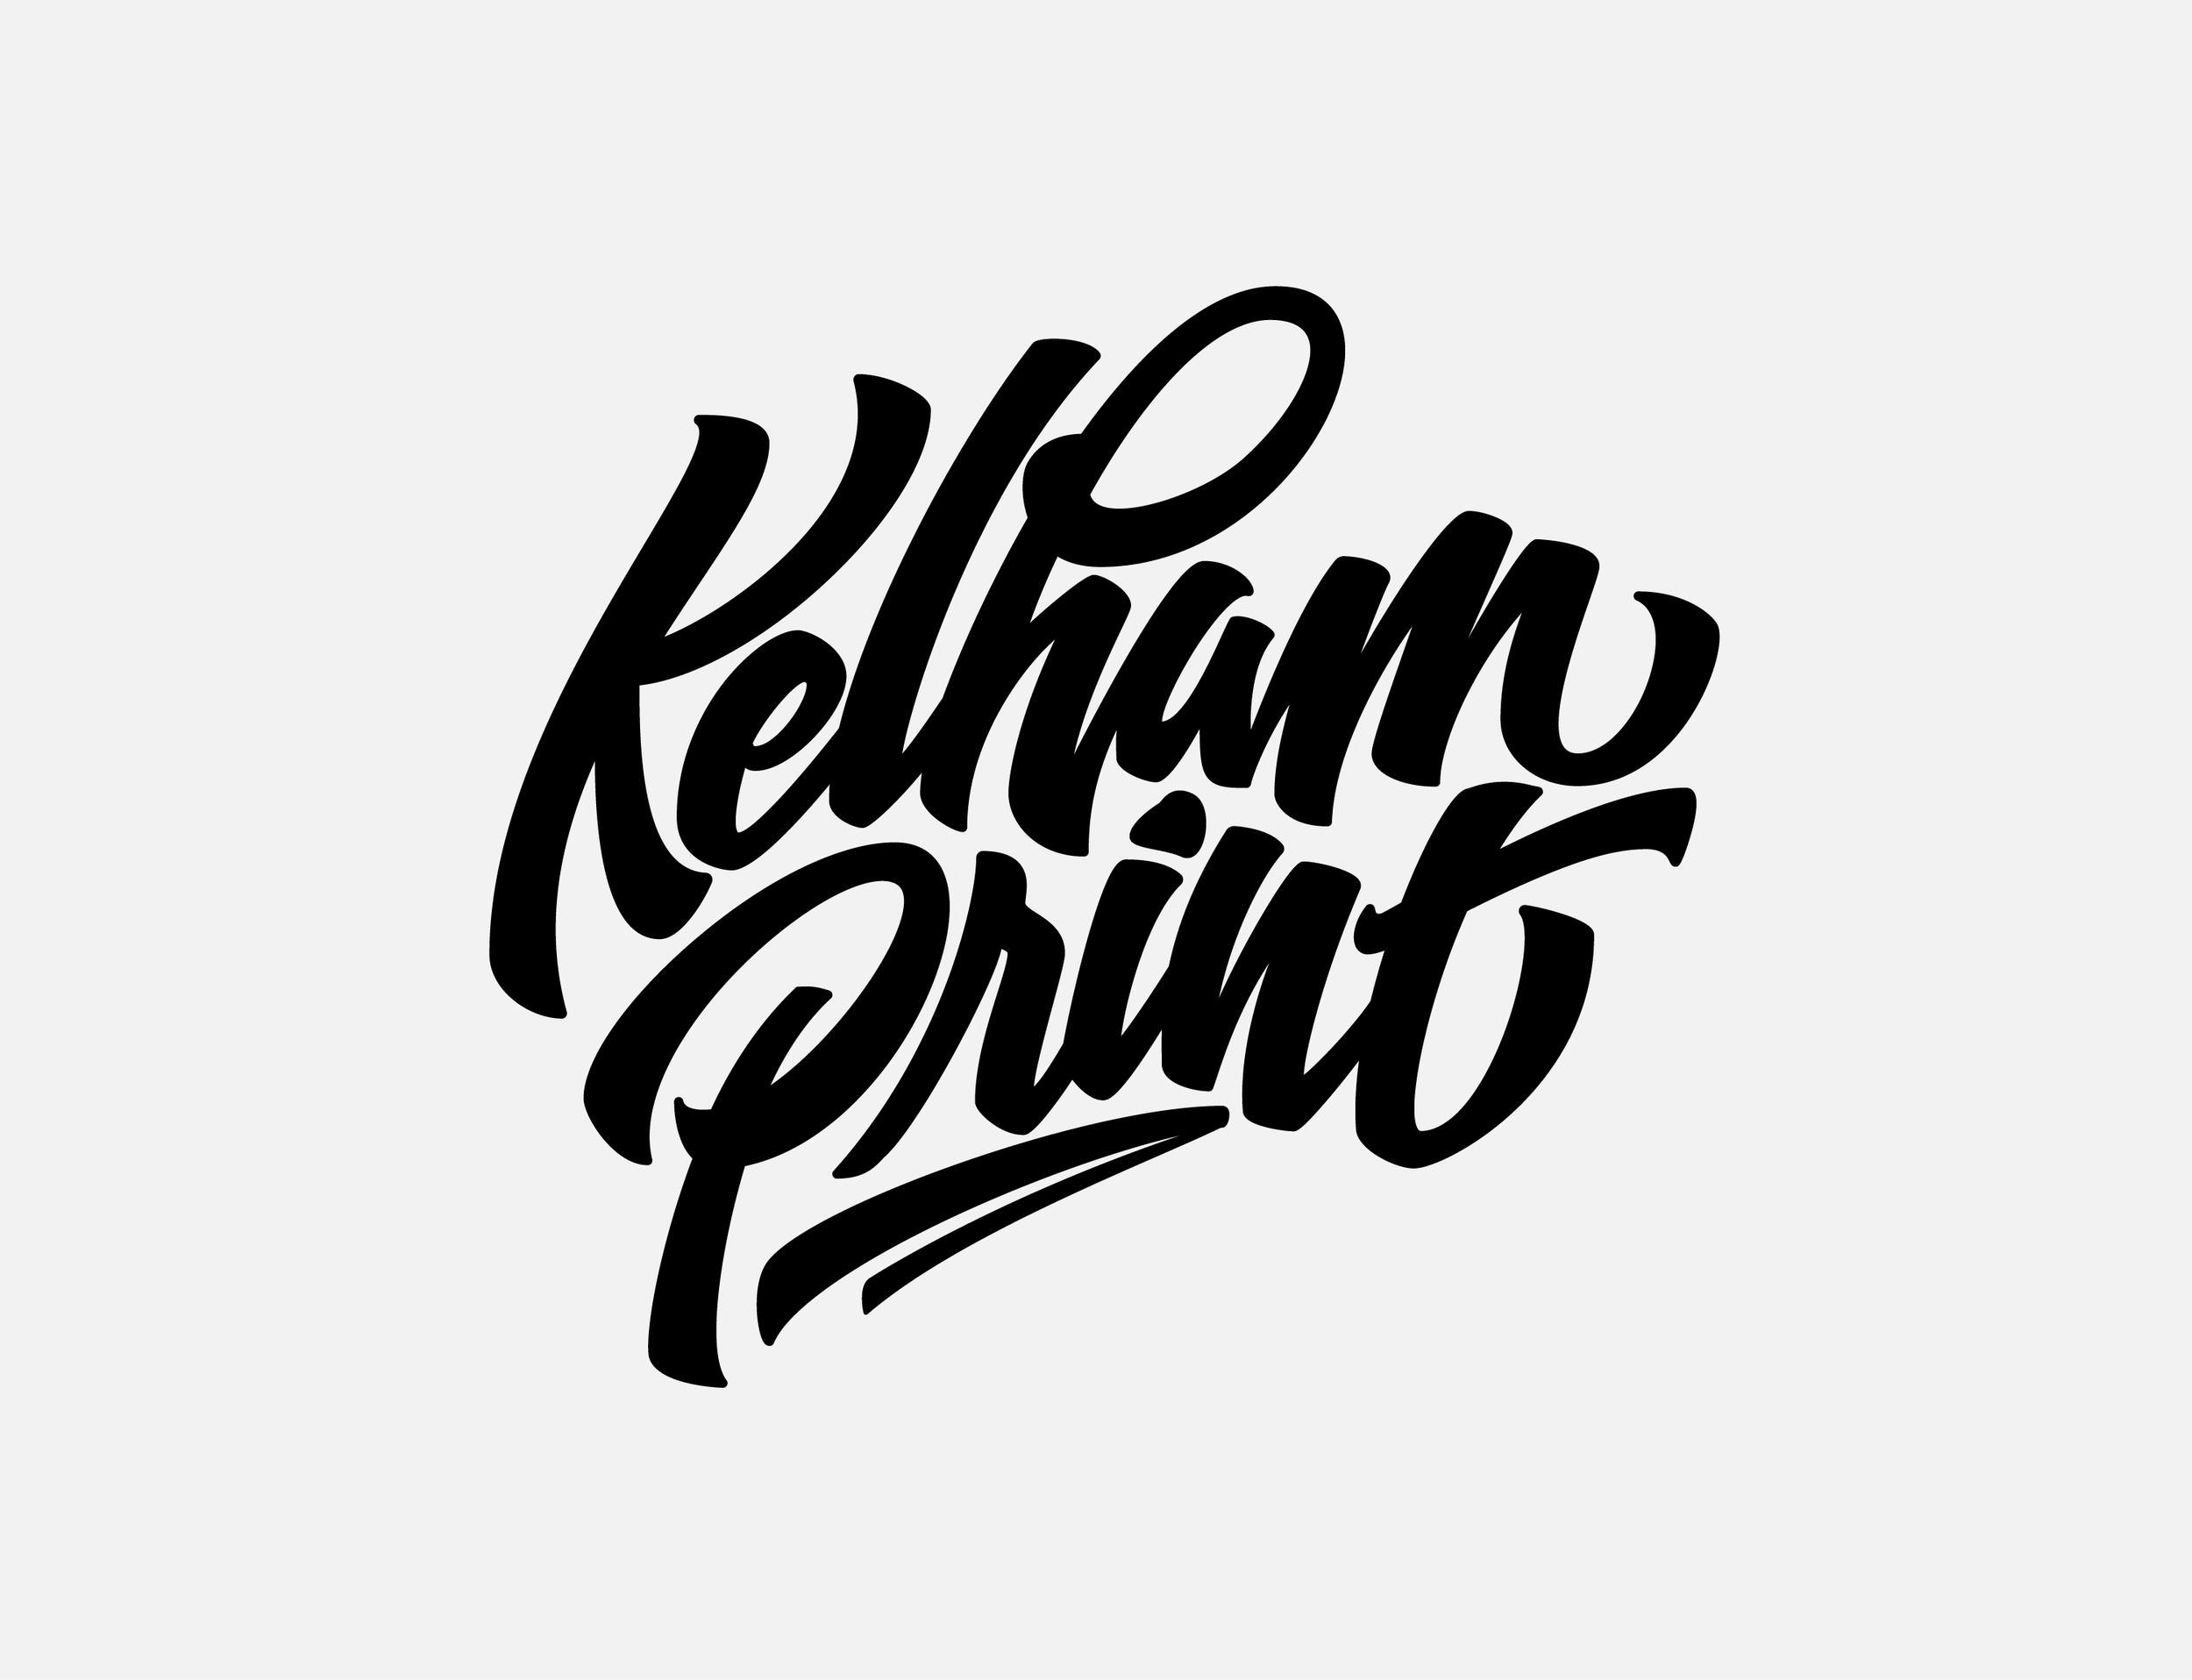 Pelham Print Black